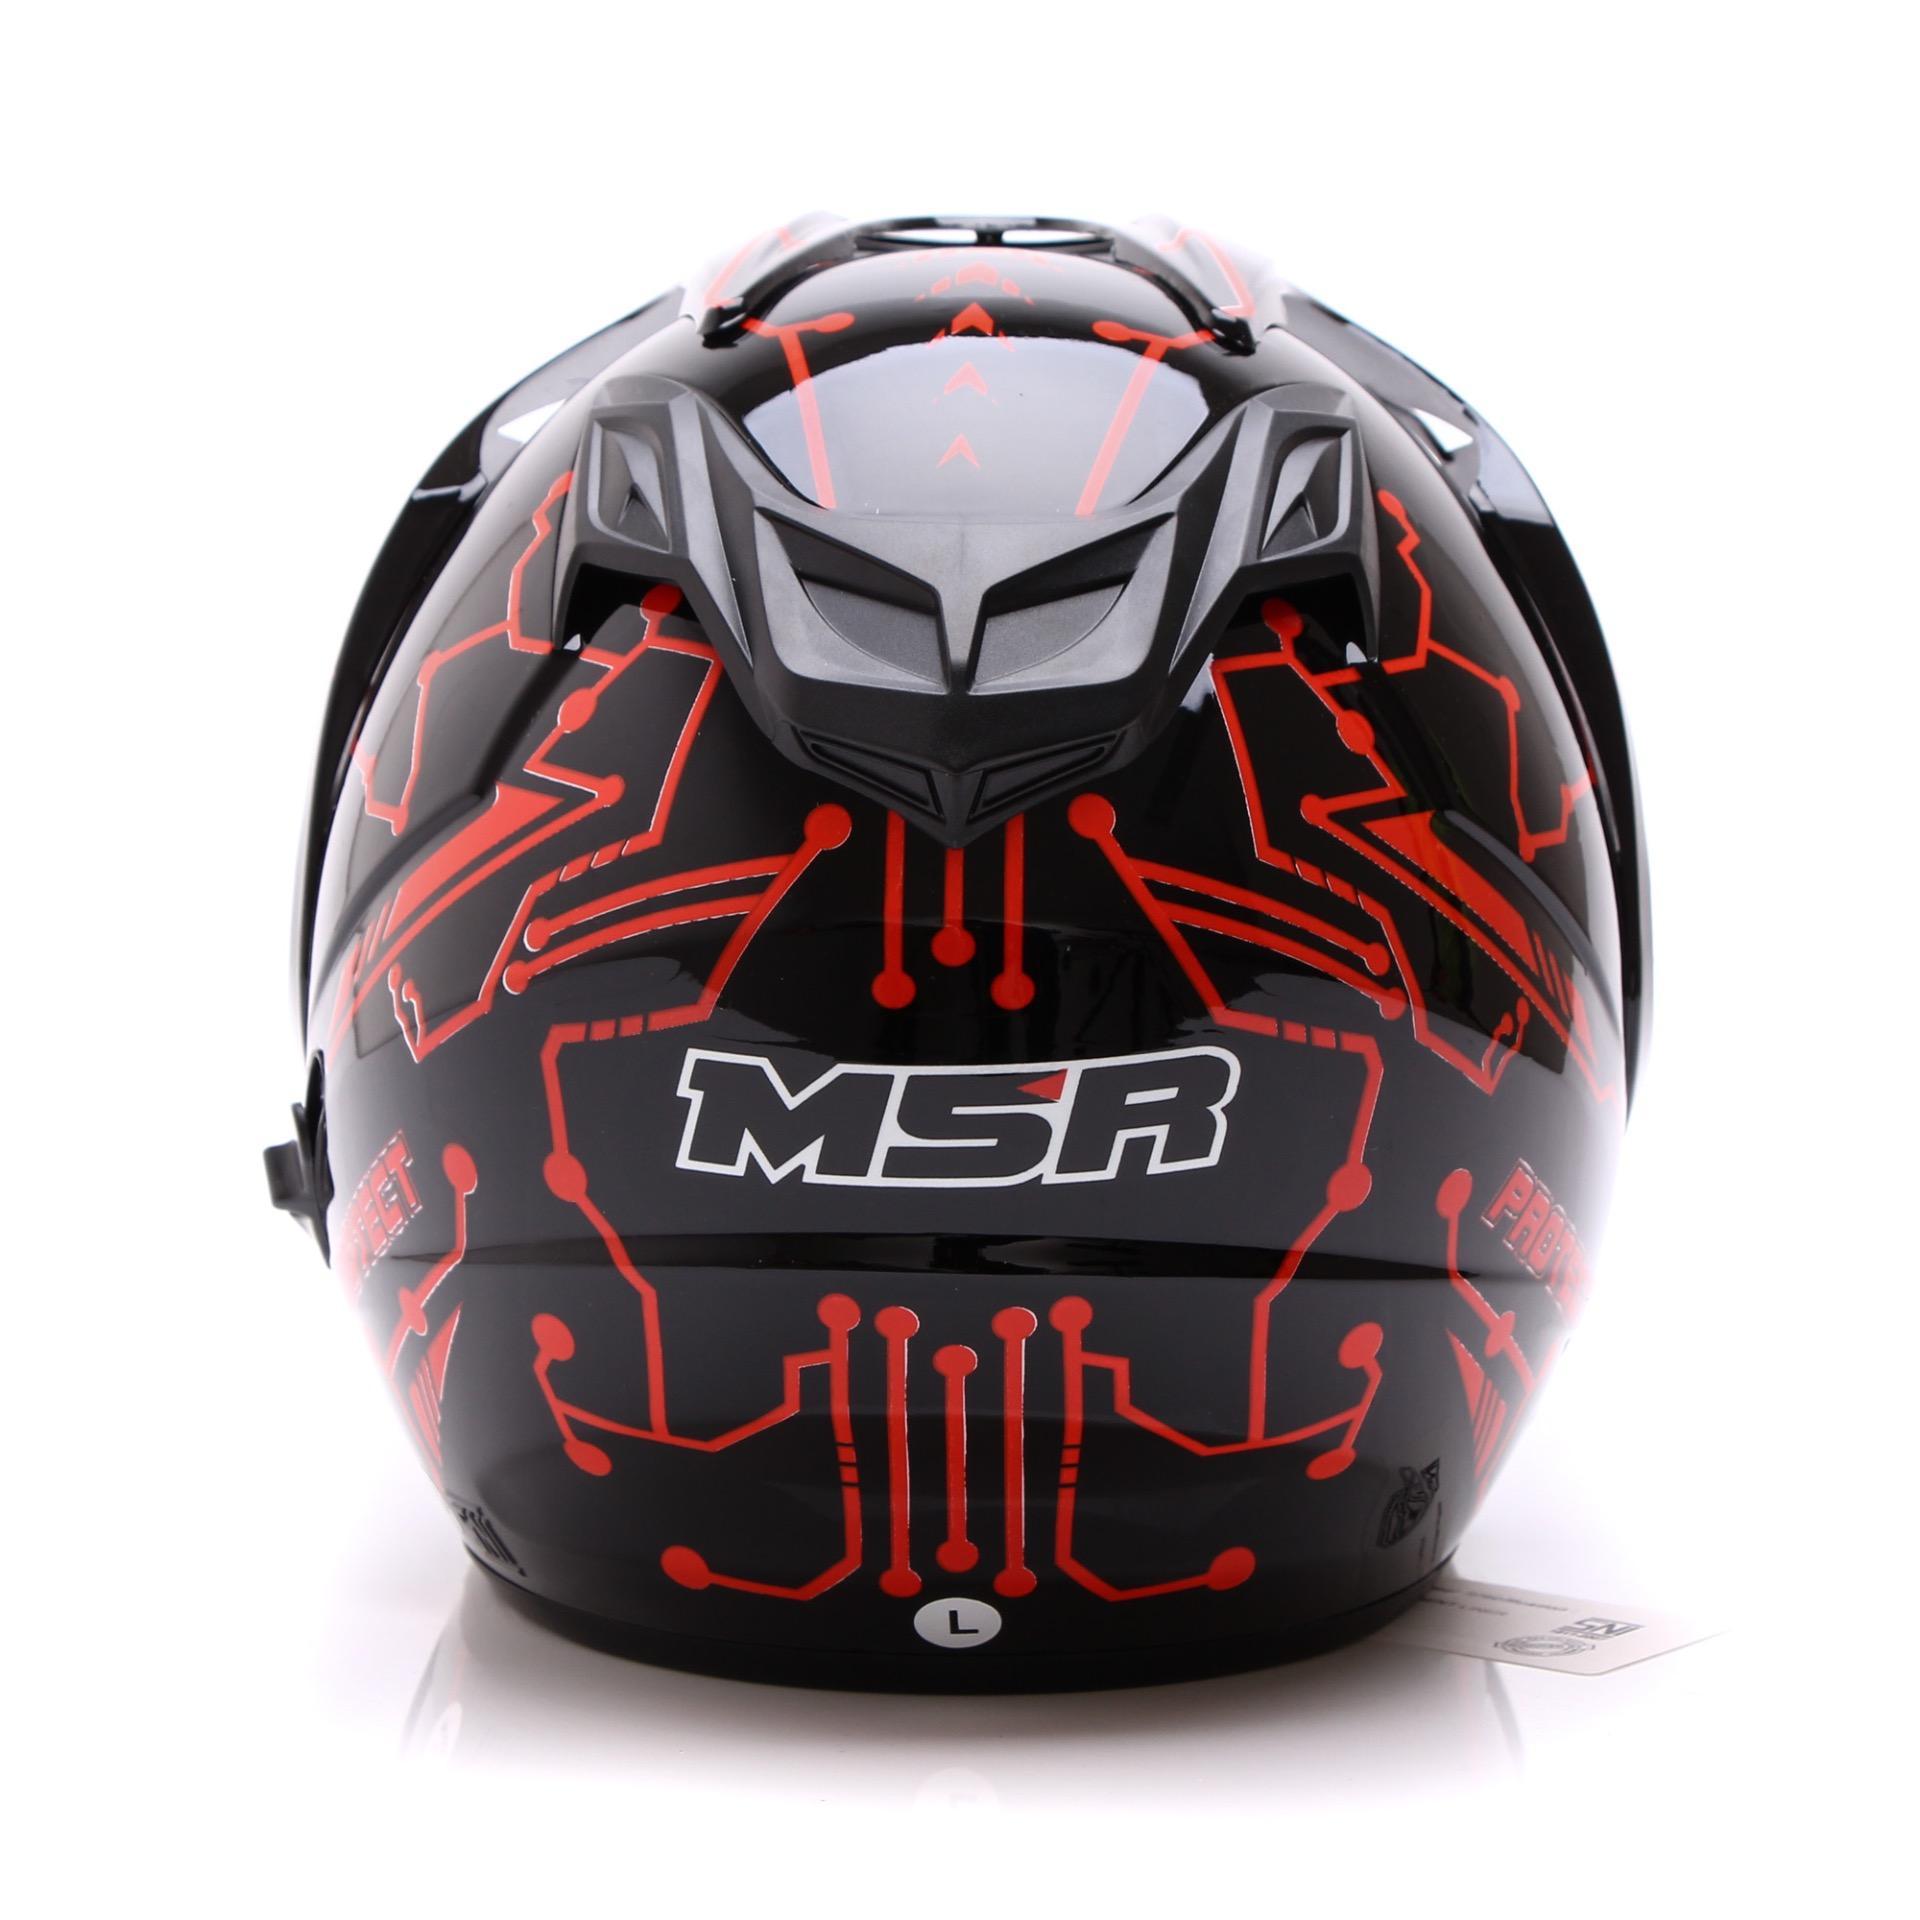 Wto Helmet Impressive Vegas Hitam Biru Promo Gratis Jaringhelm Helm Viper Polos Free Jaring Msr Protect Merah